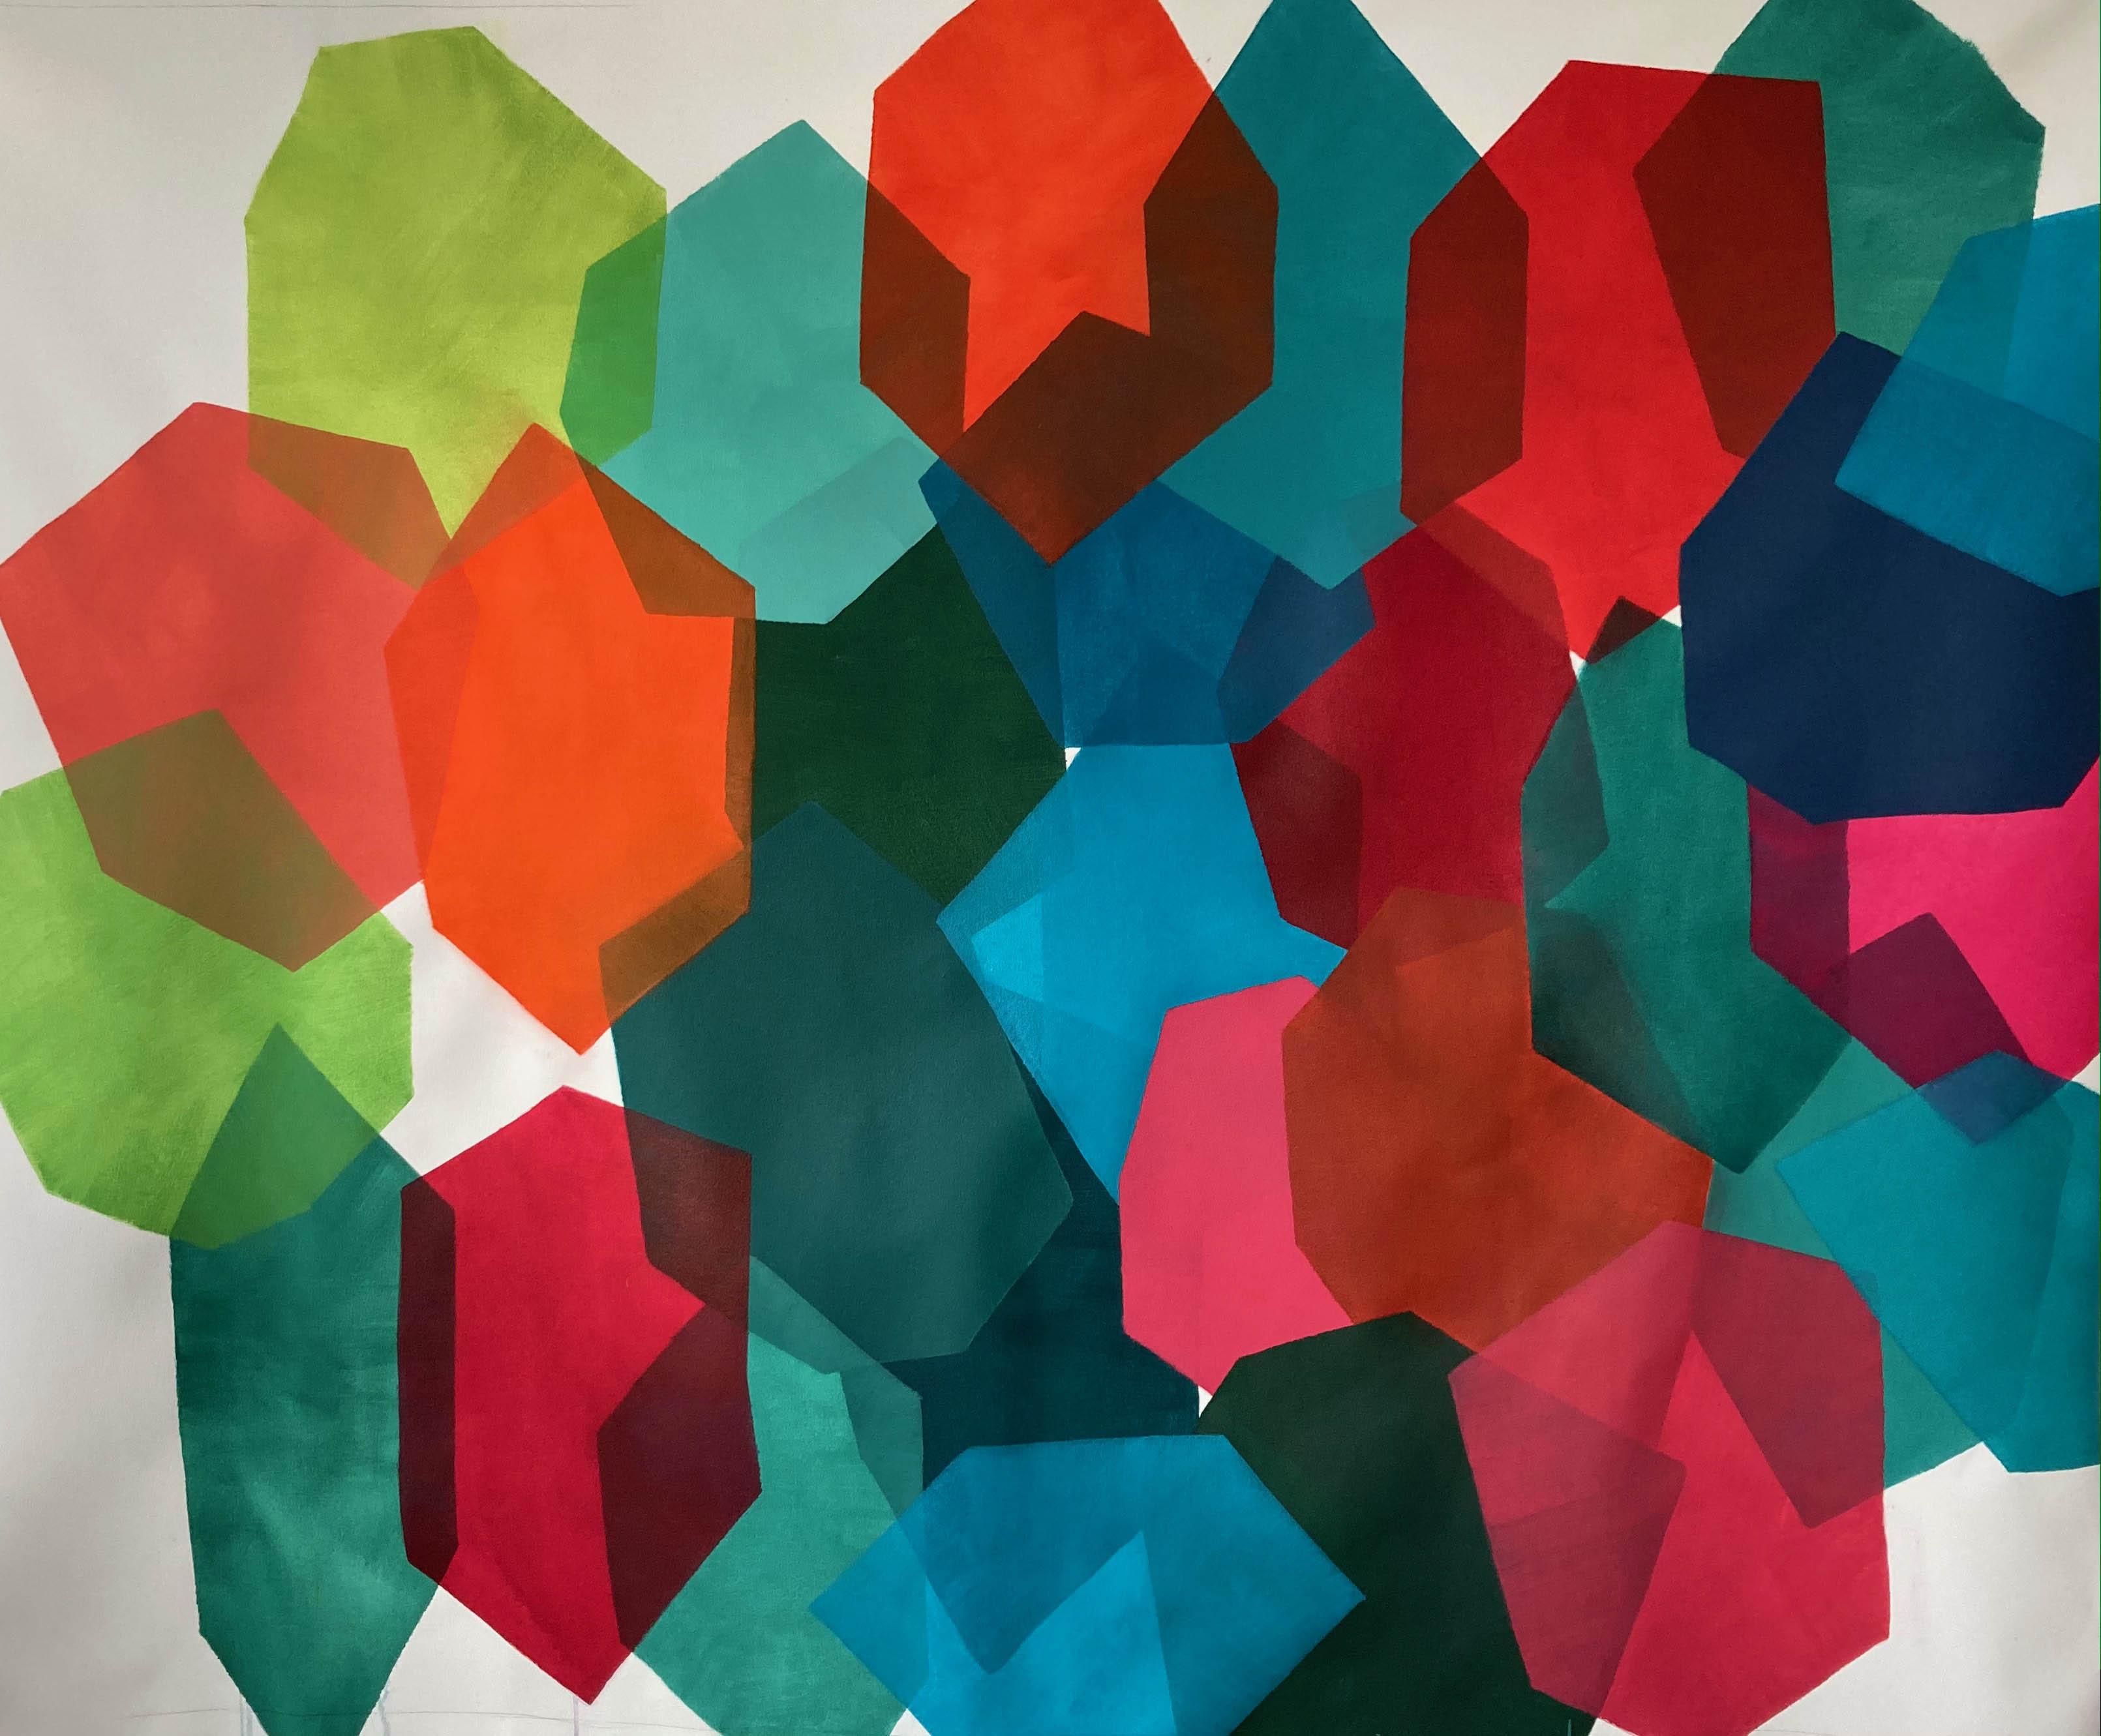 Vetores de Calor Heat Vectors 2021 Acrílica e aquarela sobre tela Acrylic and watercolor on canvas 148 x 180 cm 58,2 in x 70,8 in